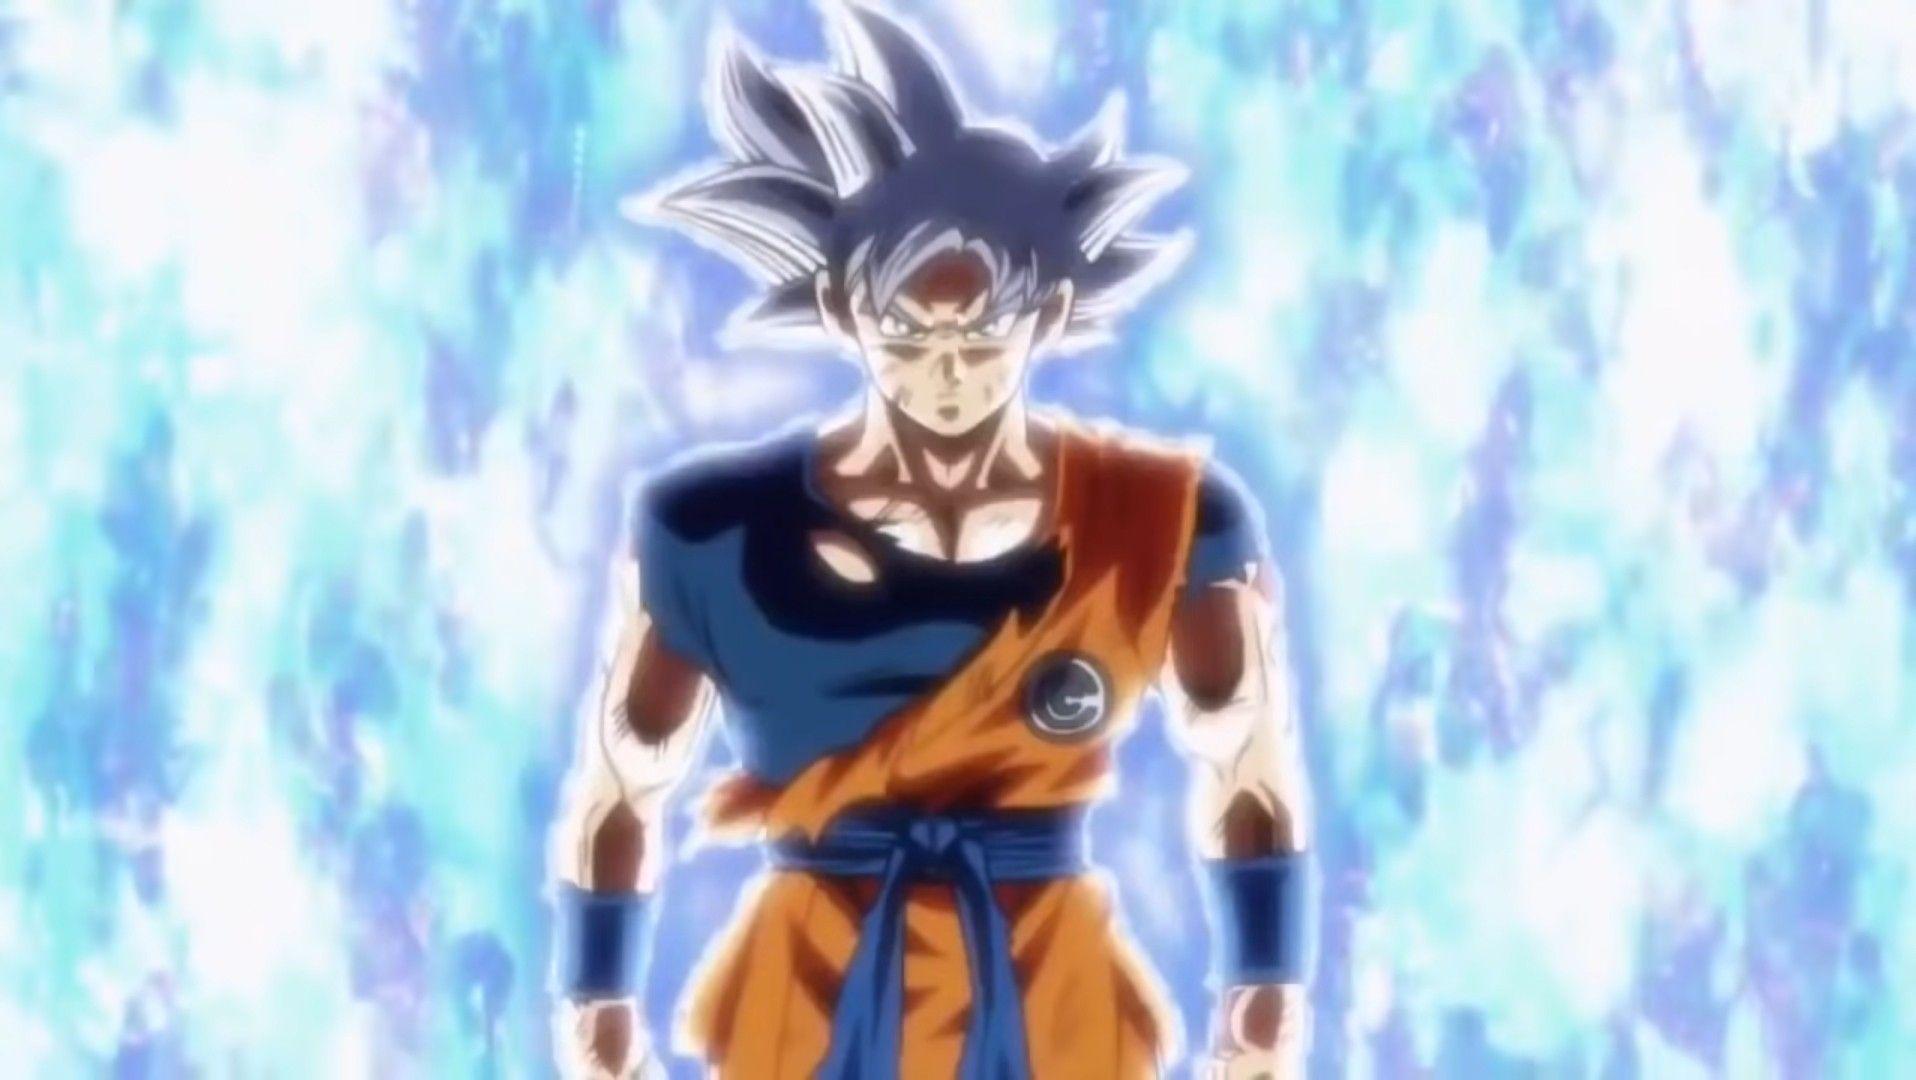 Ultra Instinct Goku In Super Dragon Ball Heroes Dragon Ball Super Manga Dragon Ball Image Goku Wallpaper